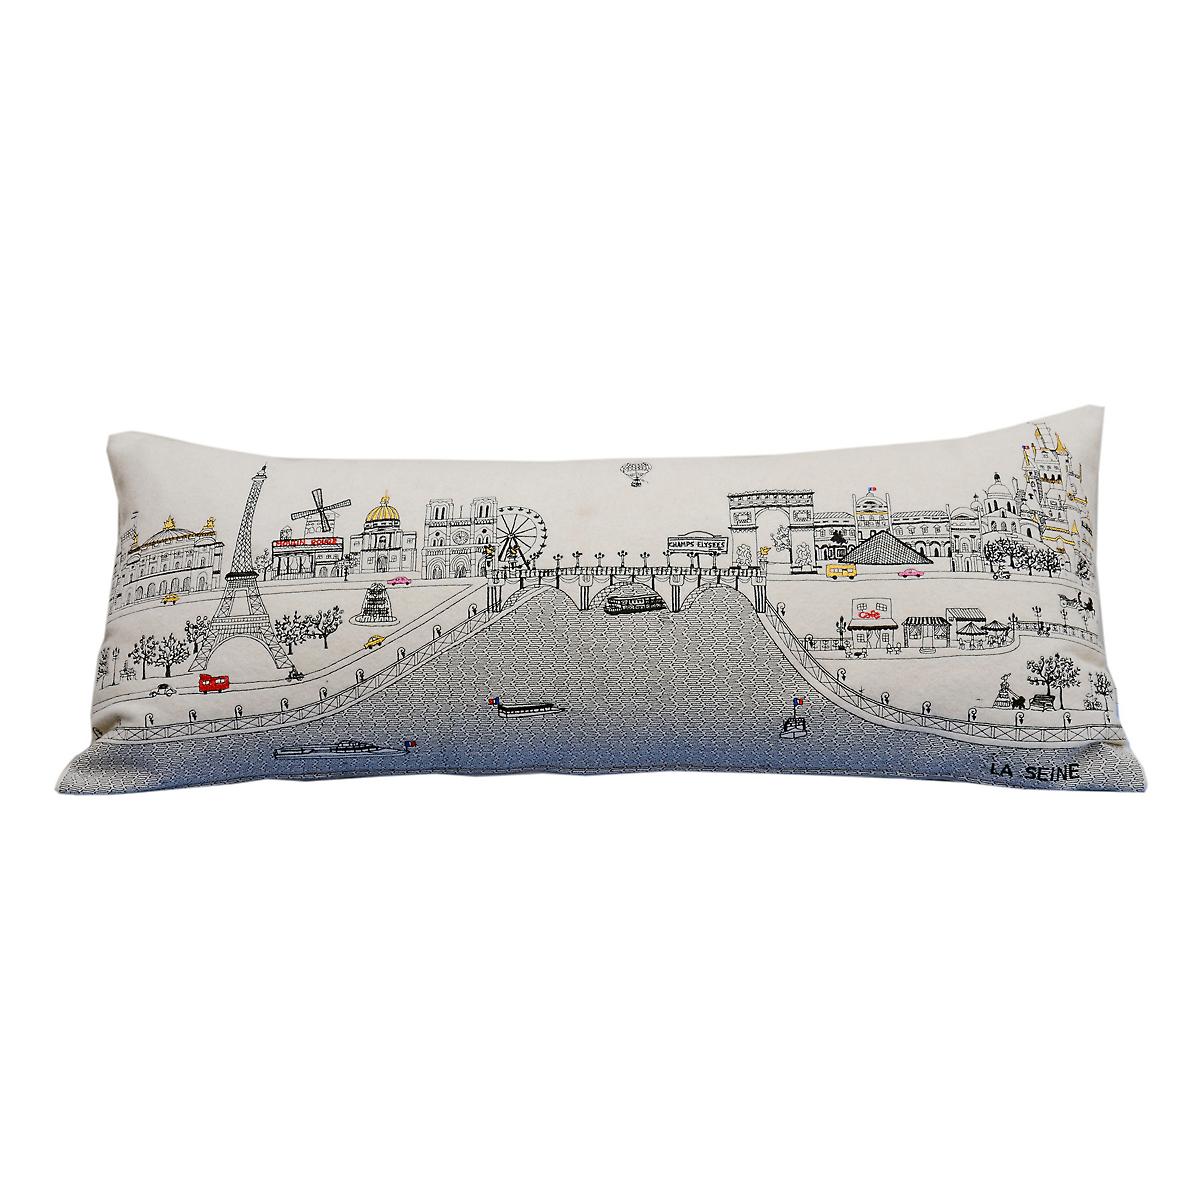 Paris Skyline Pillow